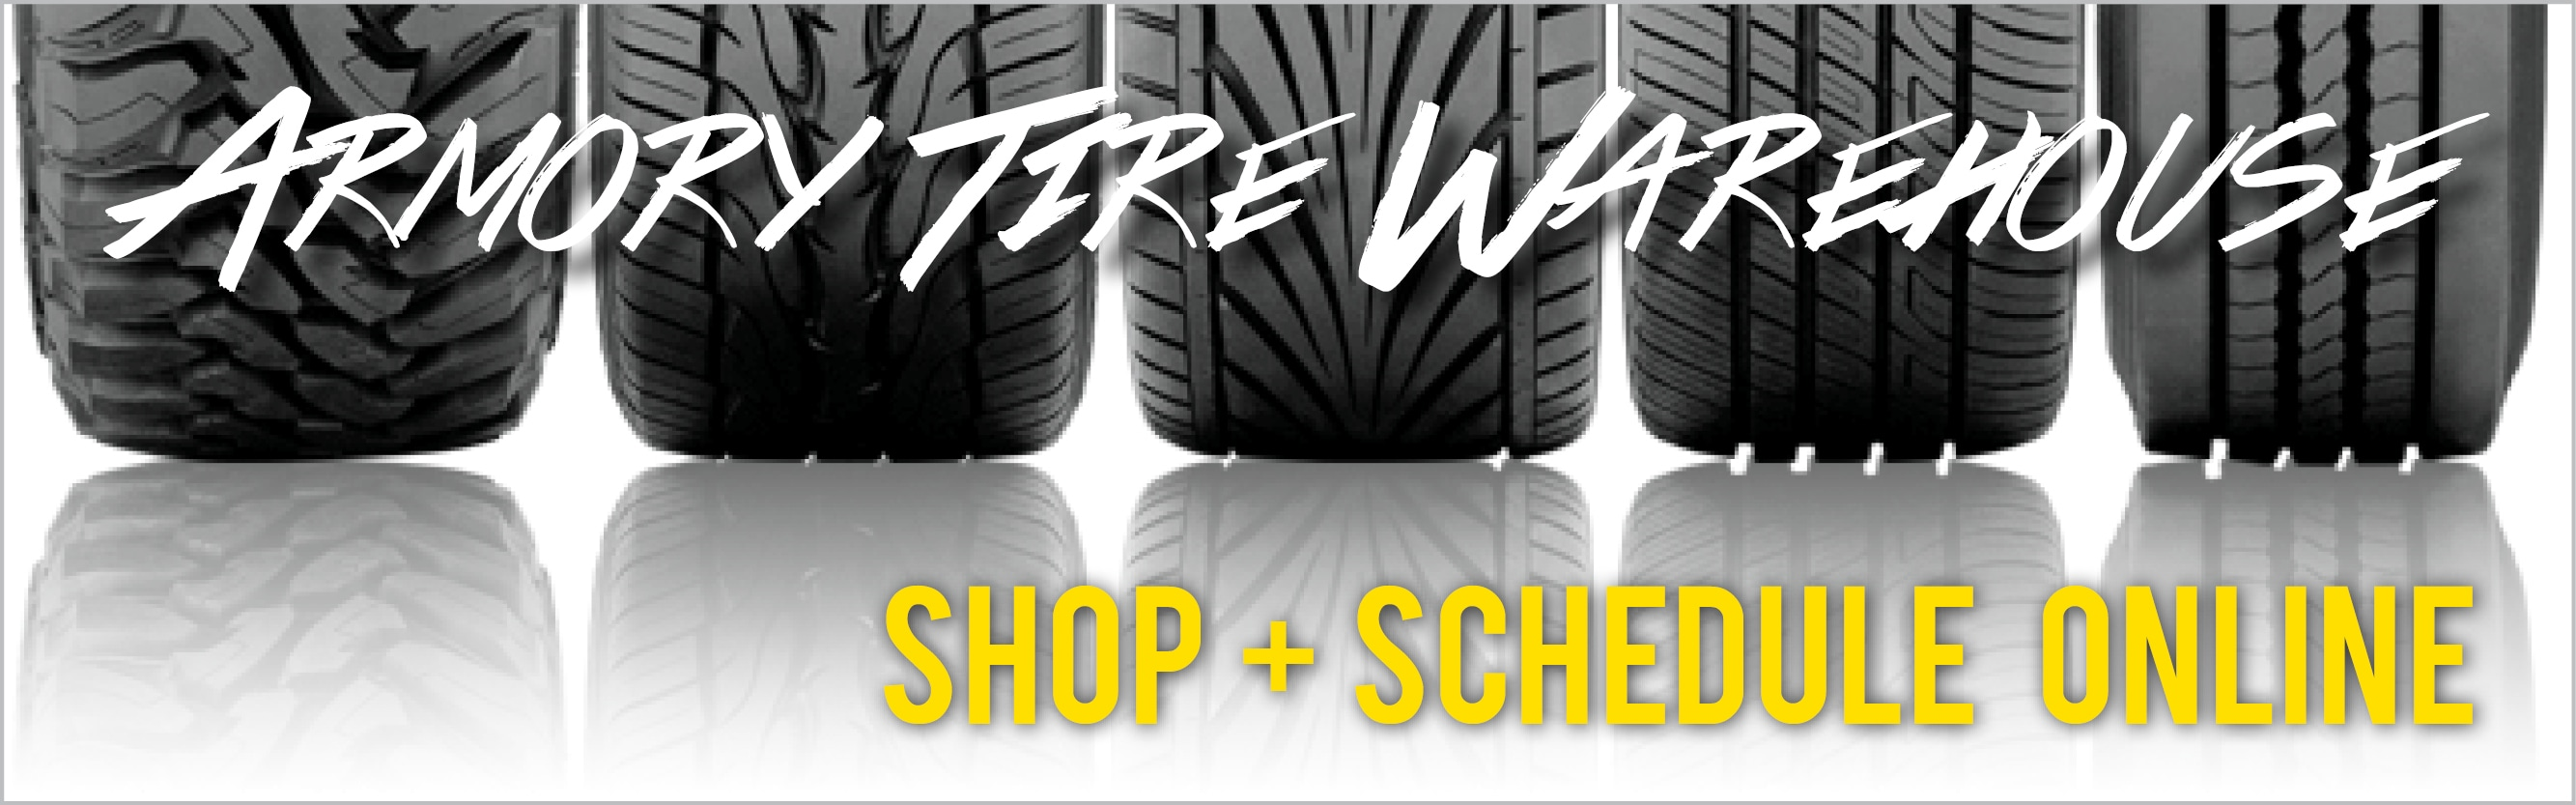 Armory Garage Tire Warehouse